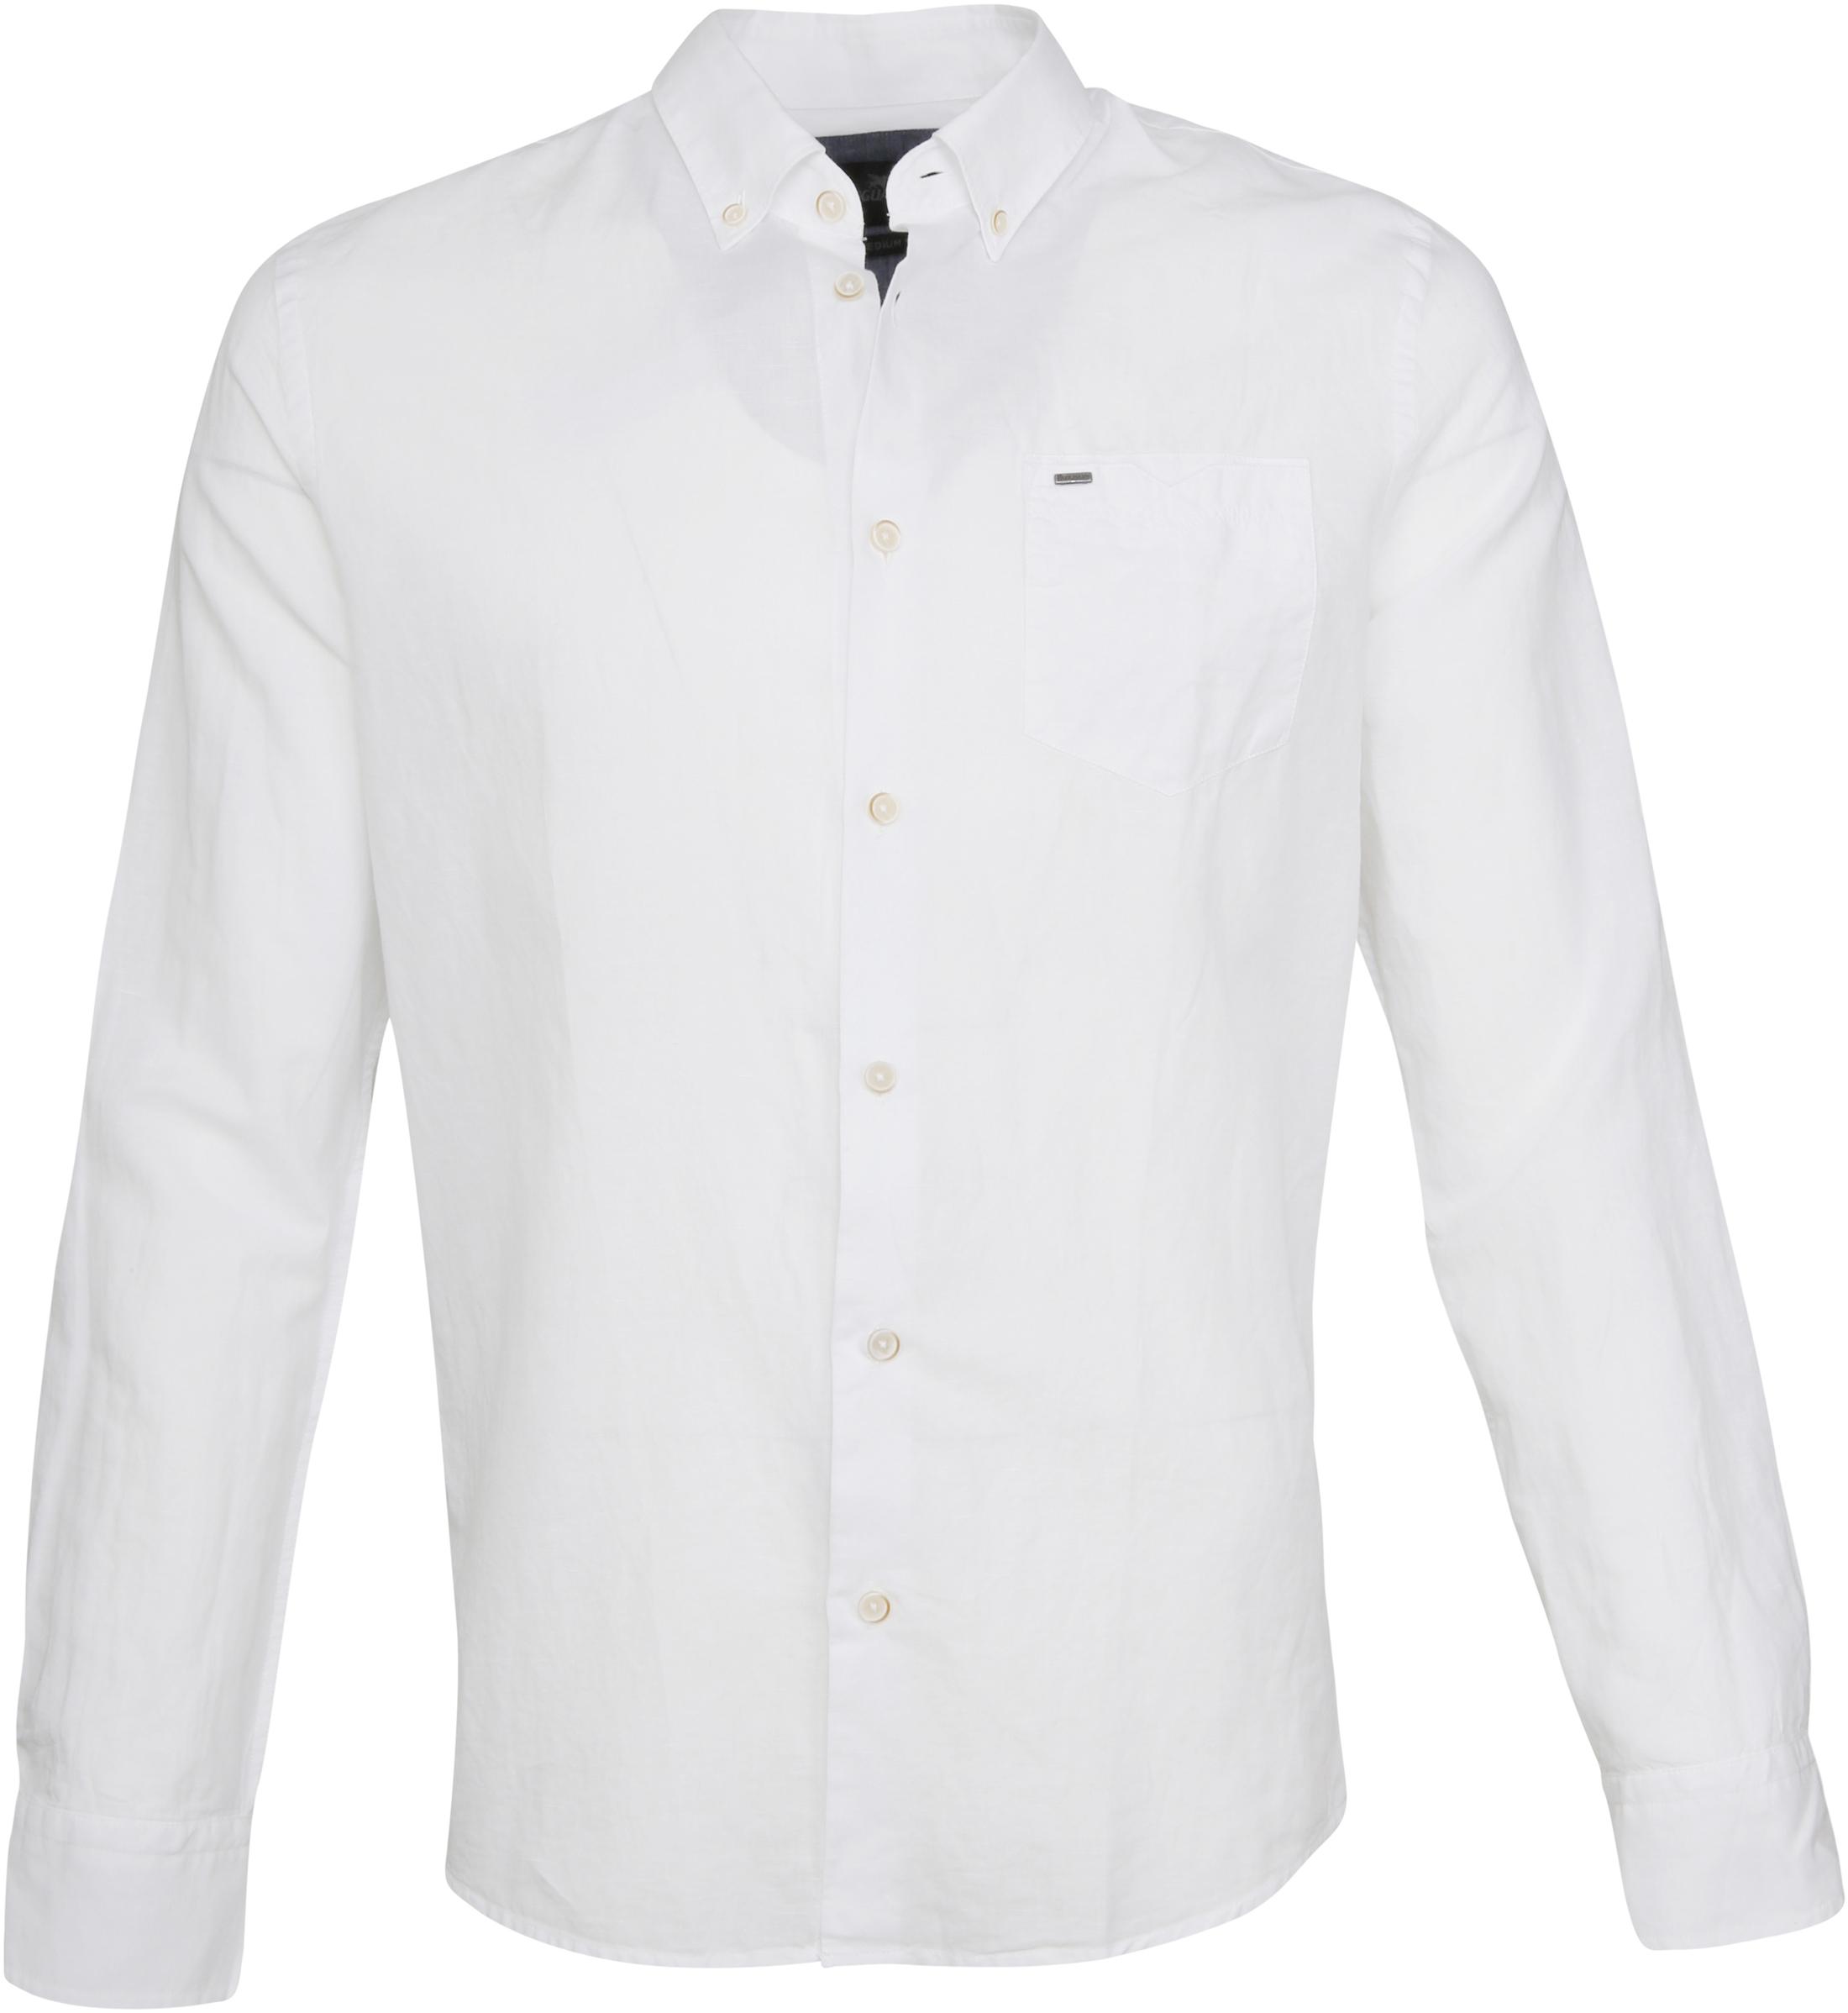 fa5a47f7939 Vanguard Casual Overhemd Wit VSI193420 online bestellen | Suitable